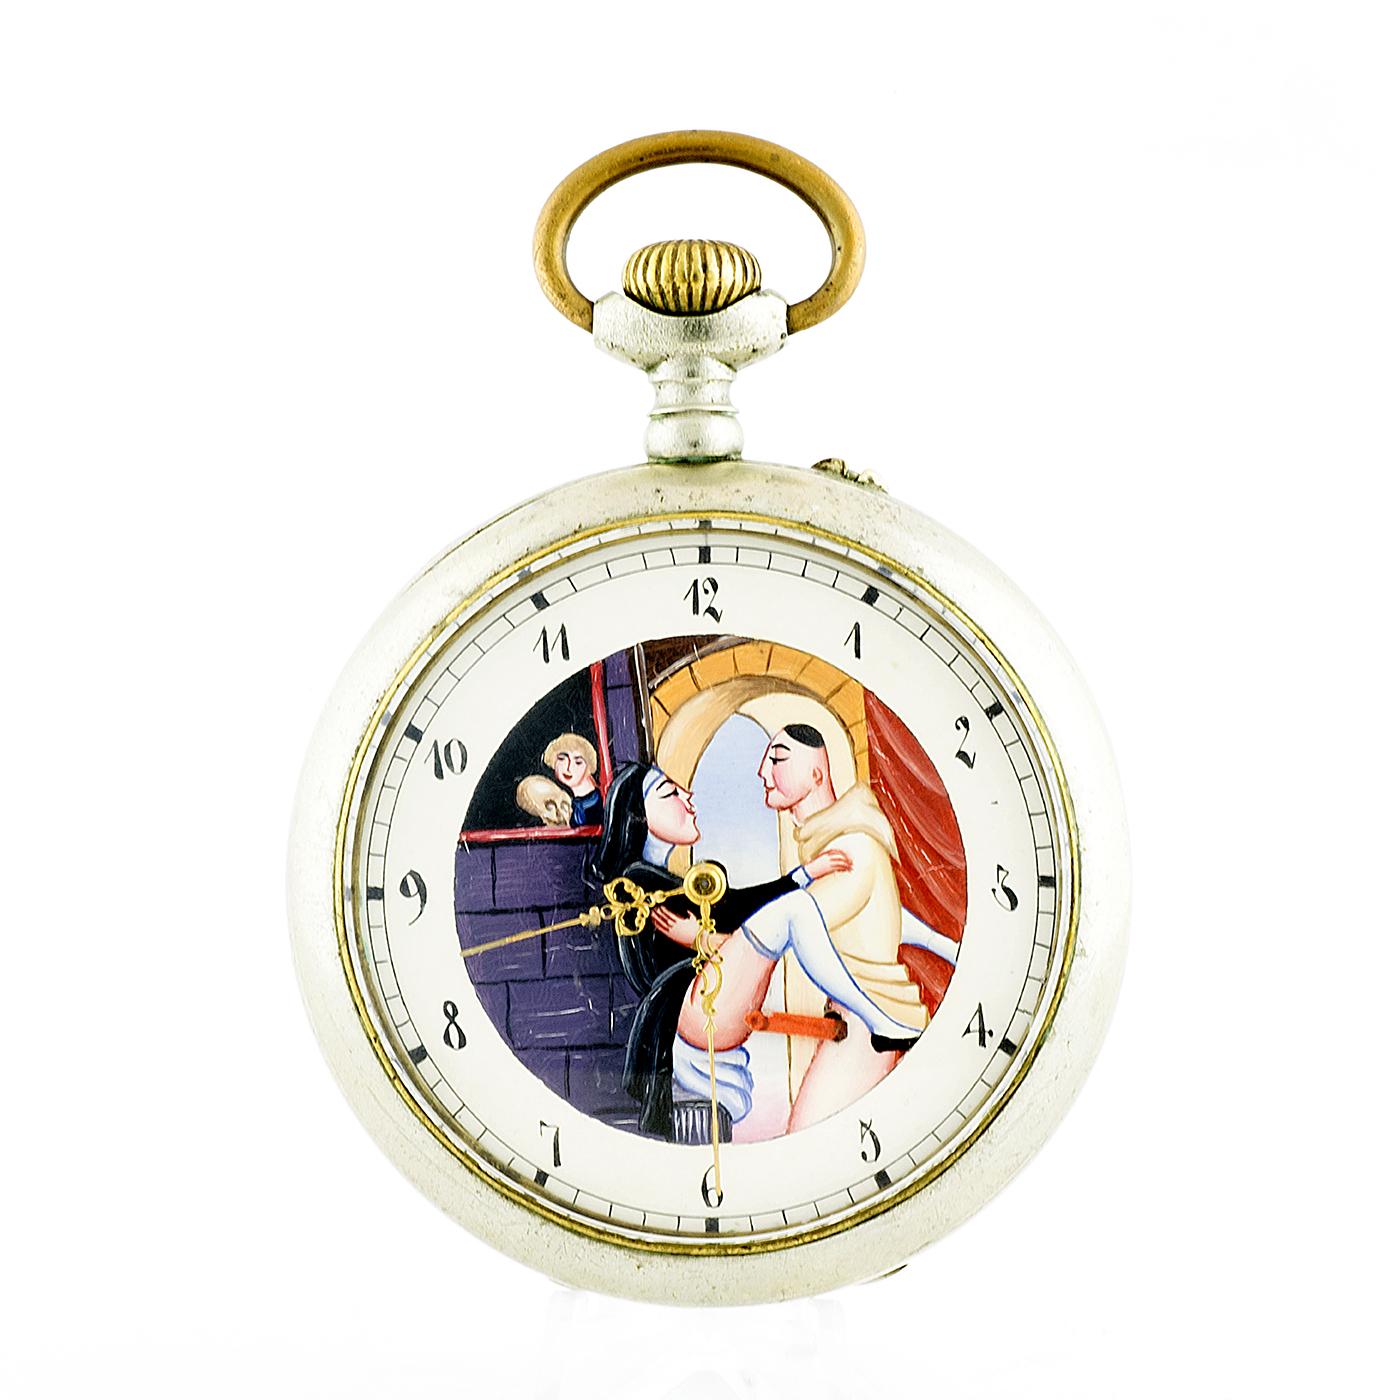 Reloj Suizo de Bolsillo, Lepine, Remontoir, Erótico, Automatón. Suiza, ca. 1900